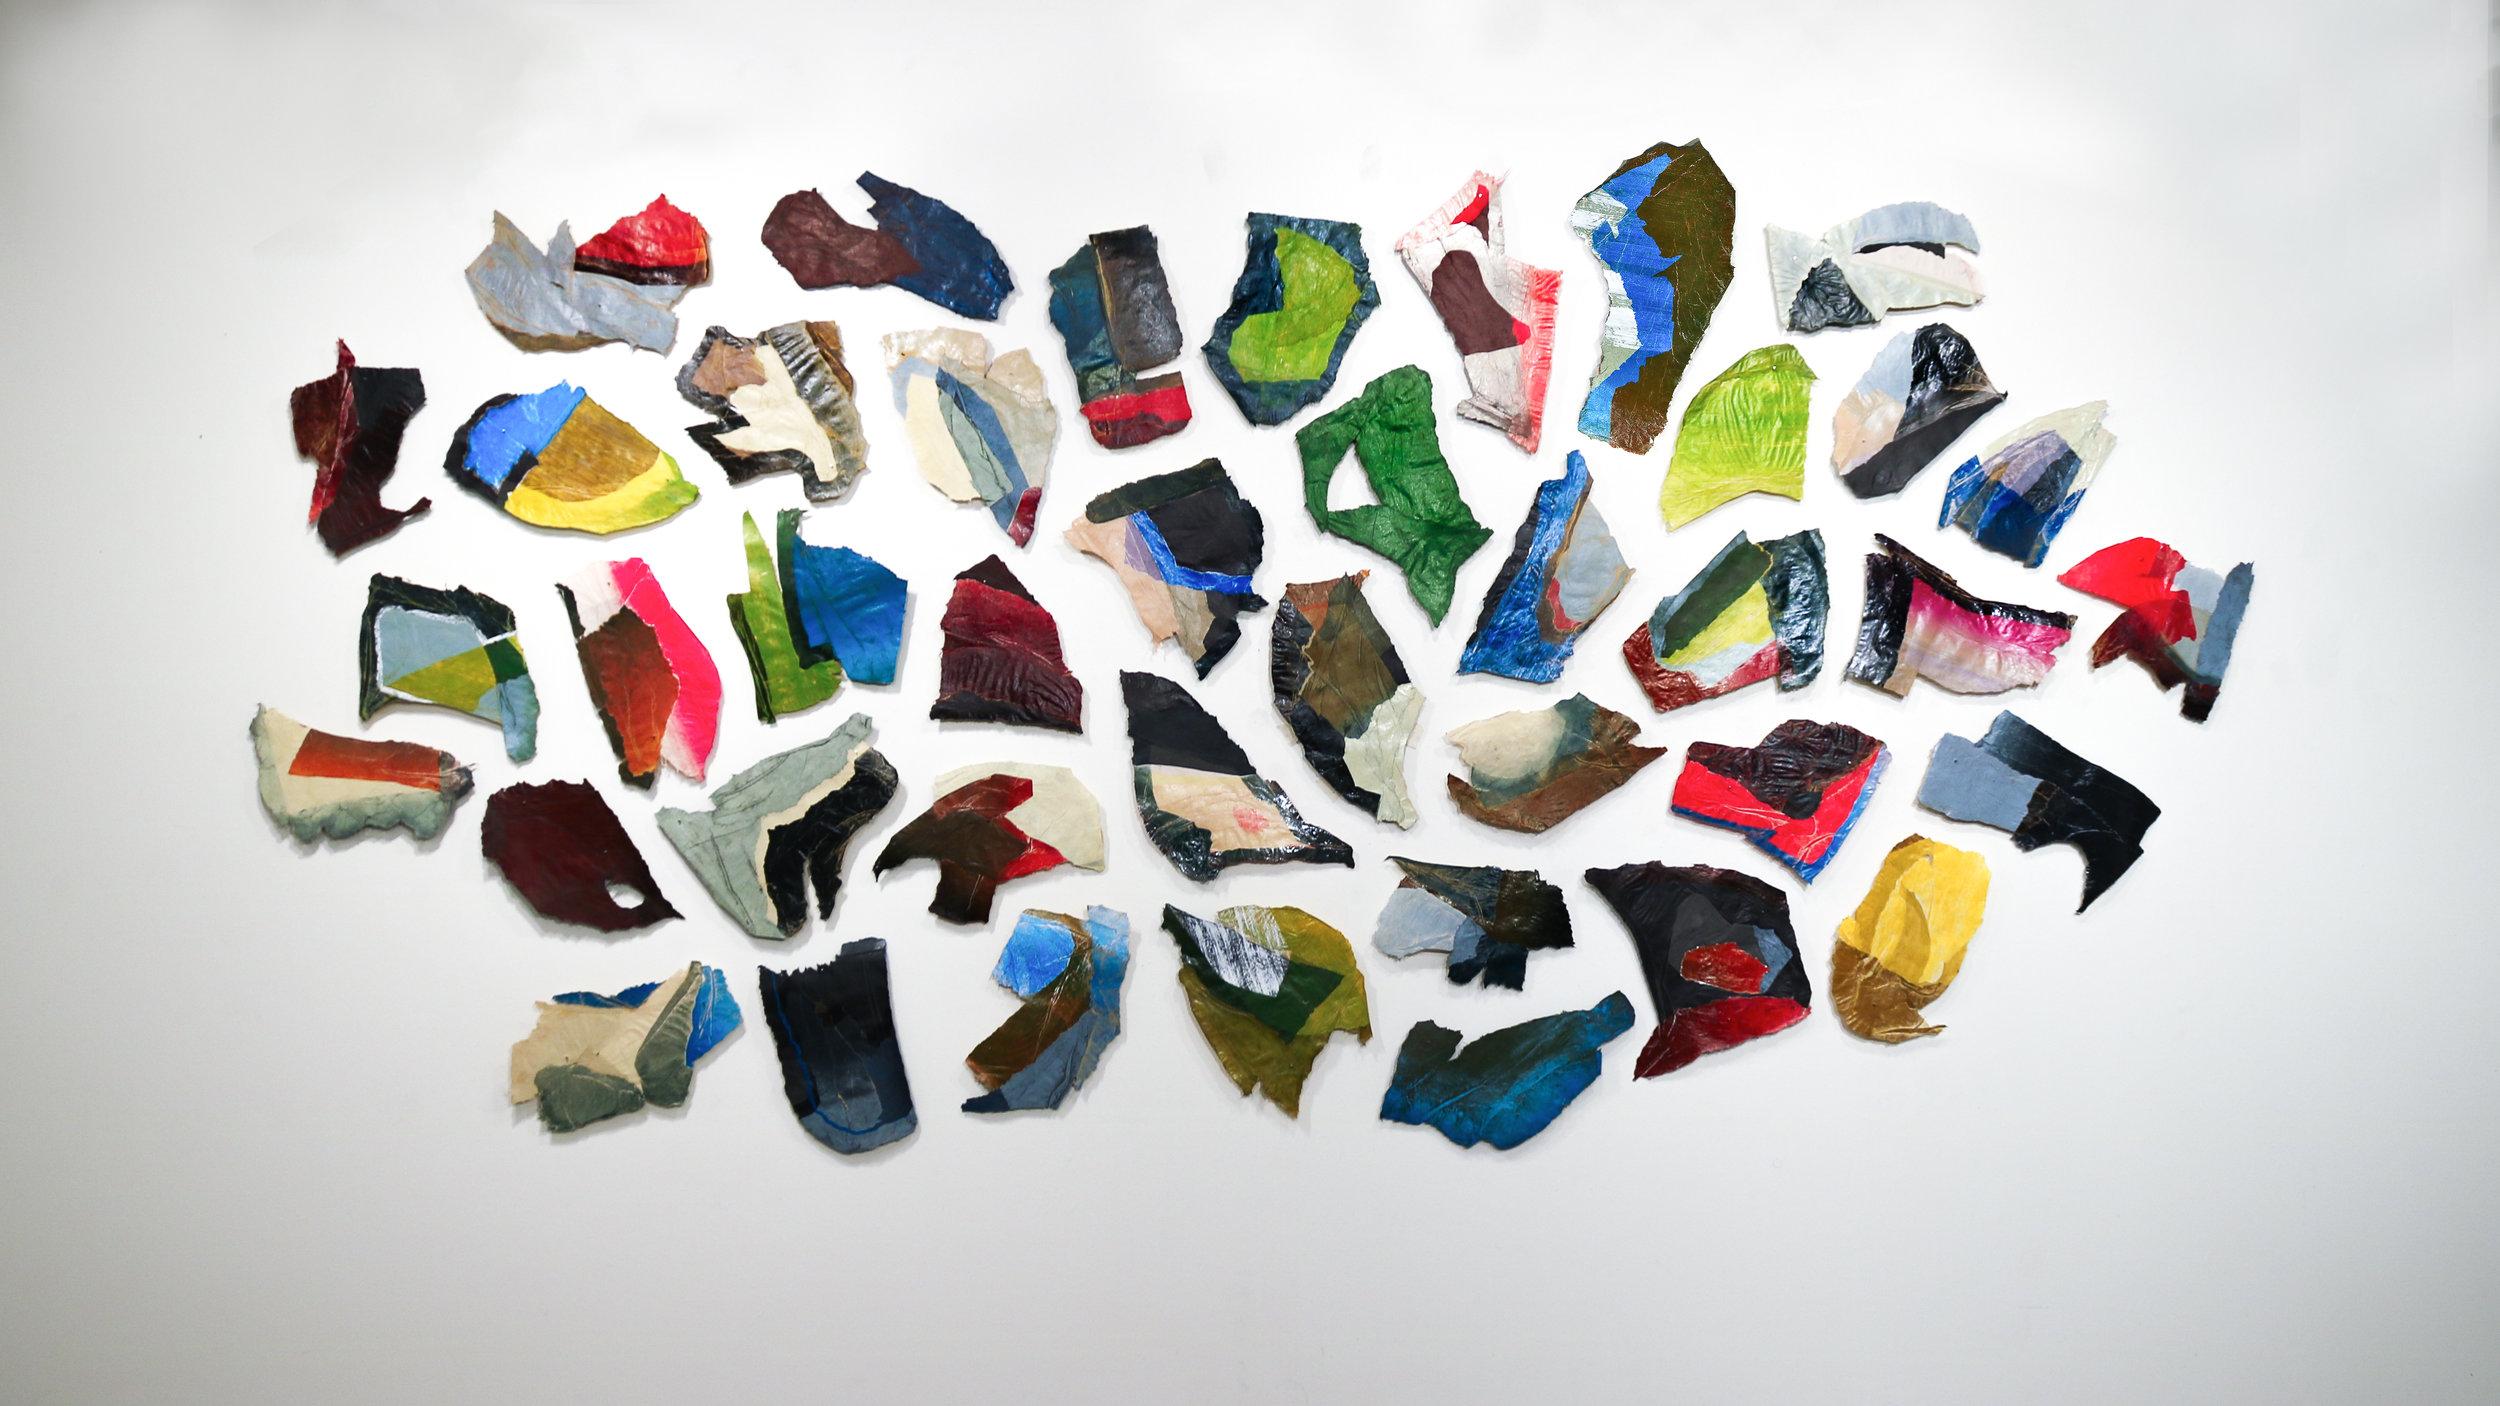 Mica Swarm,  Installed in Colorado College's Coburn Gallery, June 2018